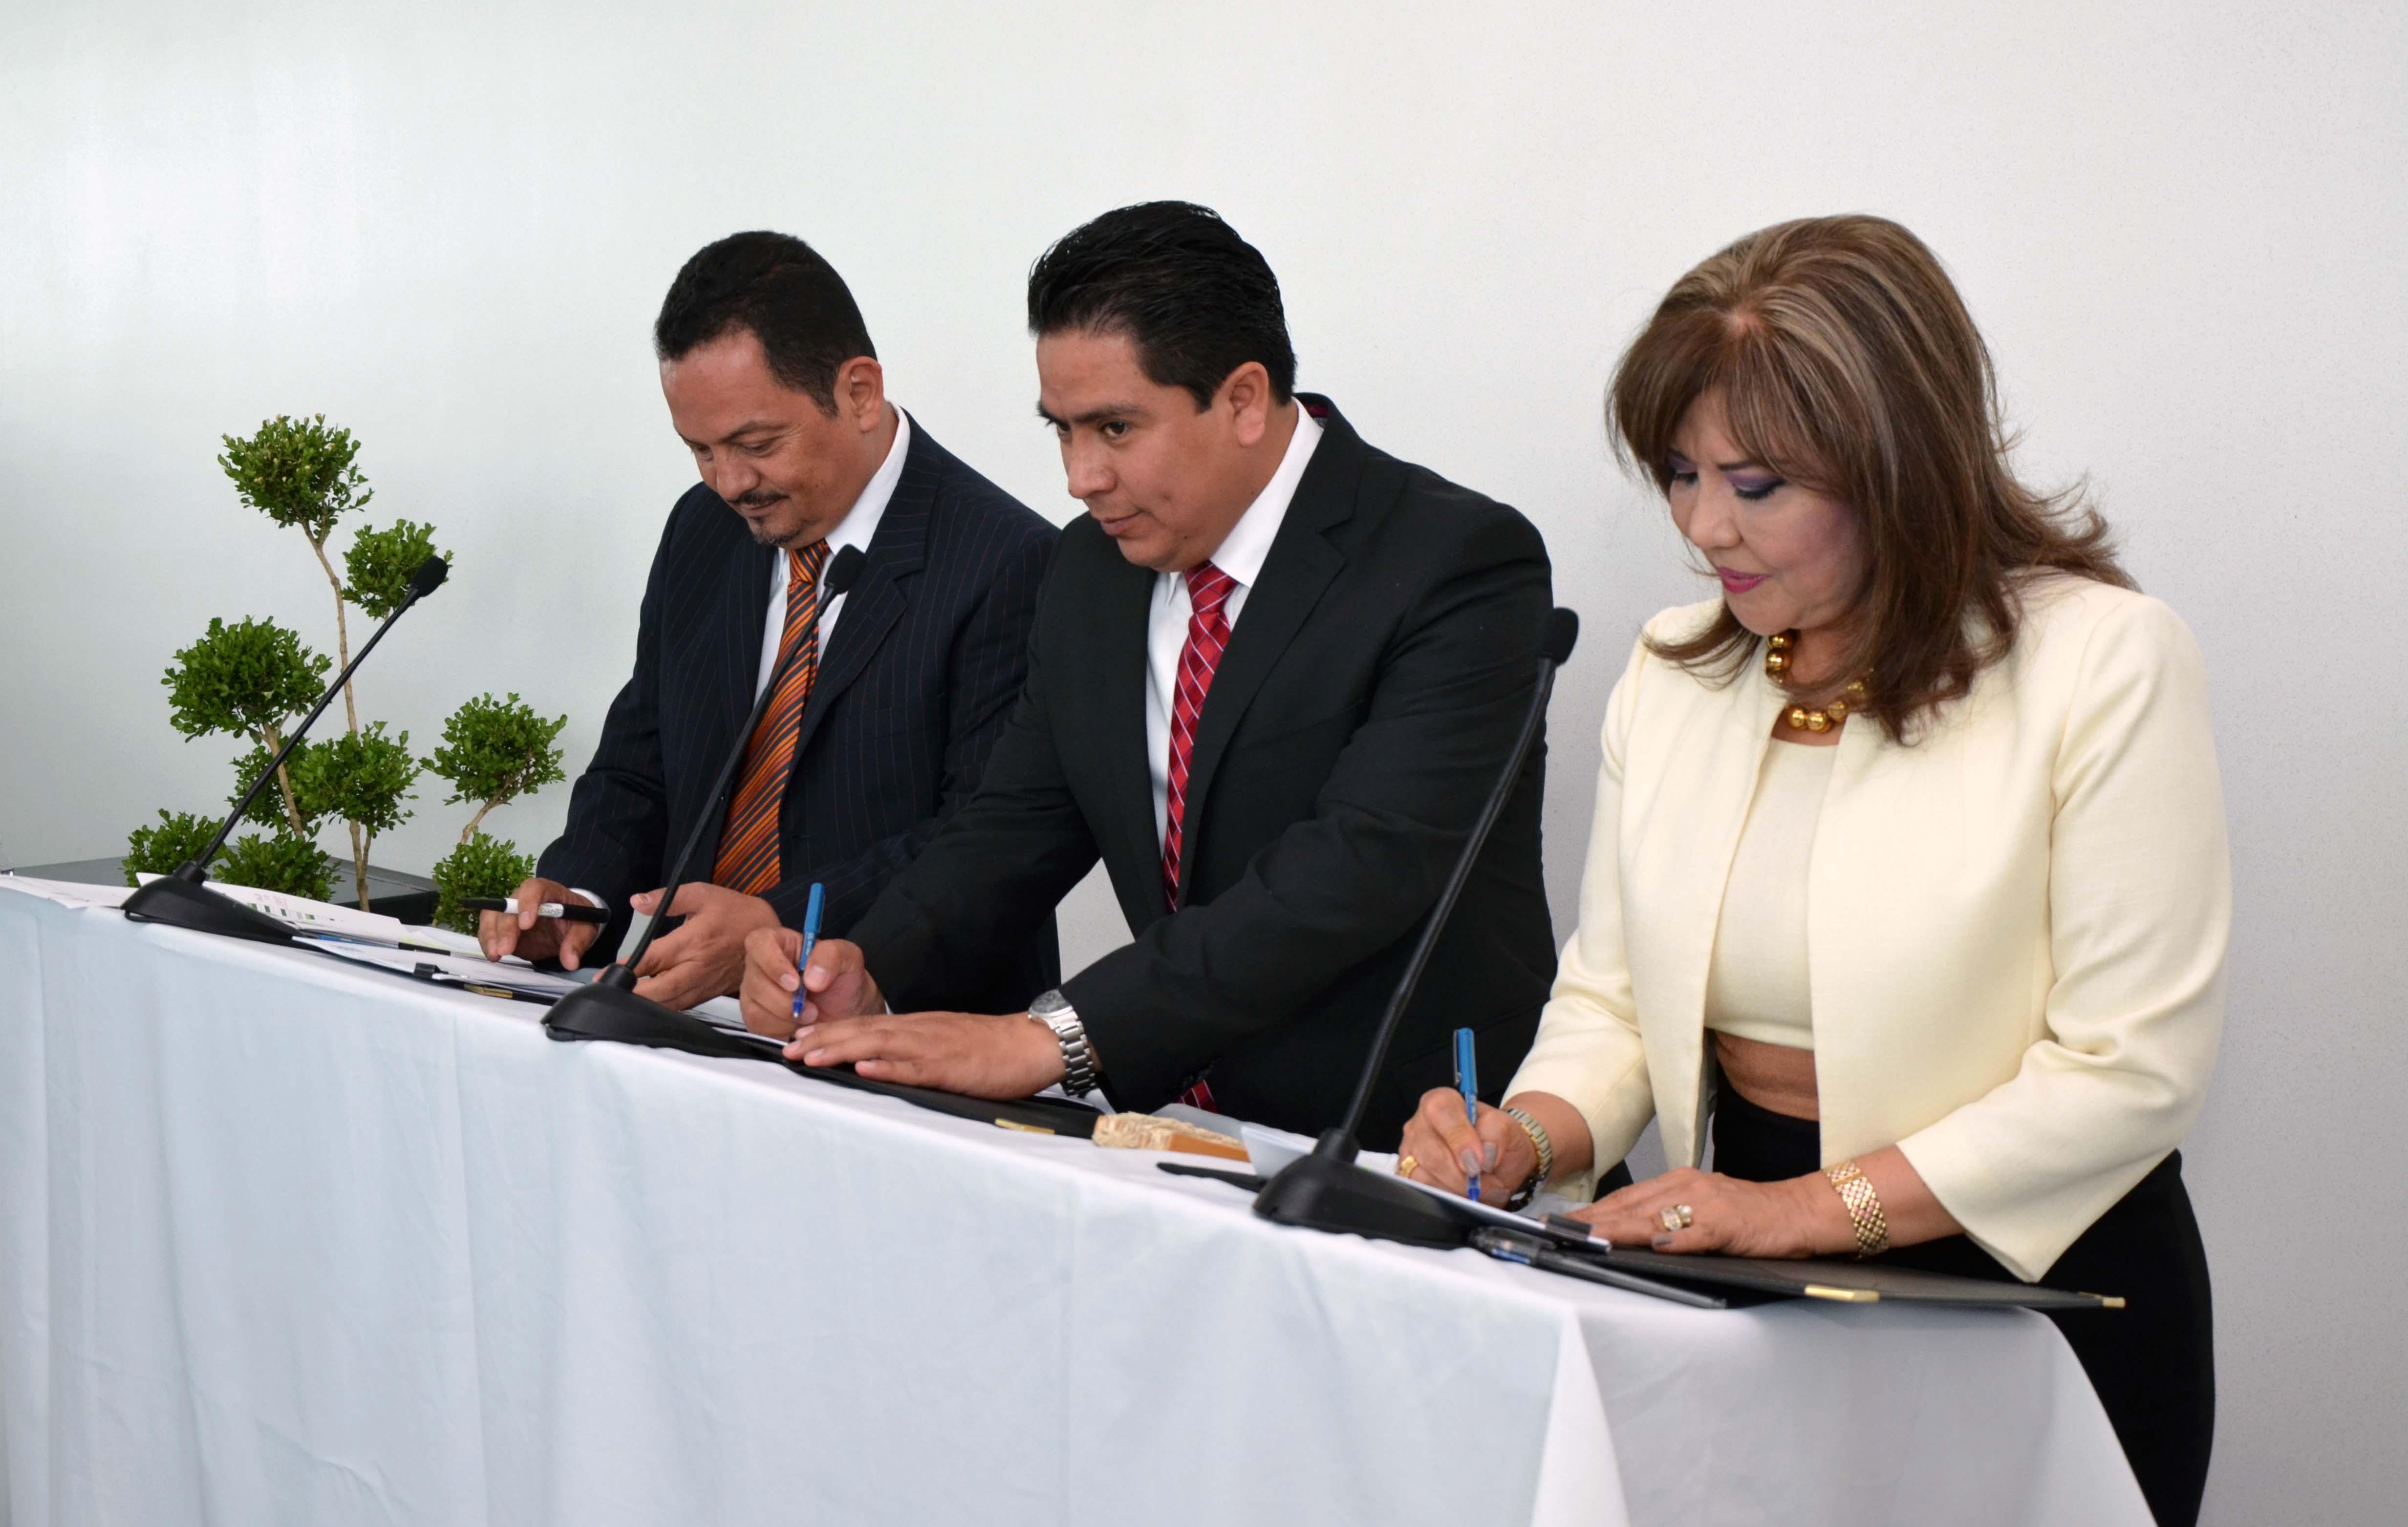 20140809 Firma de Convenio Servicios IMSS ISSSTE Salud 02jpg